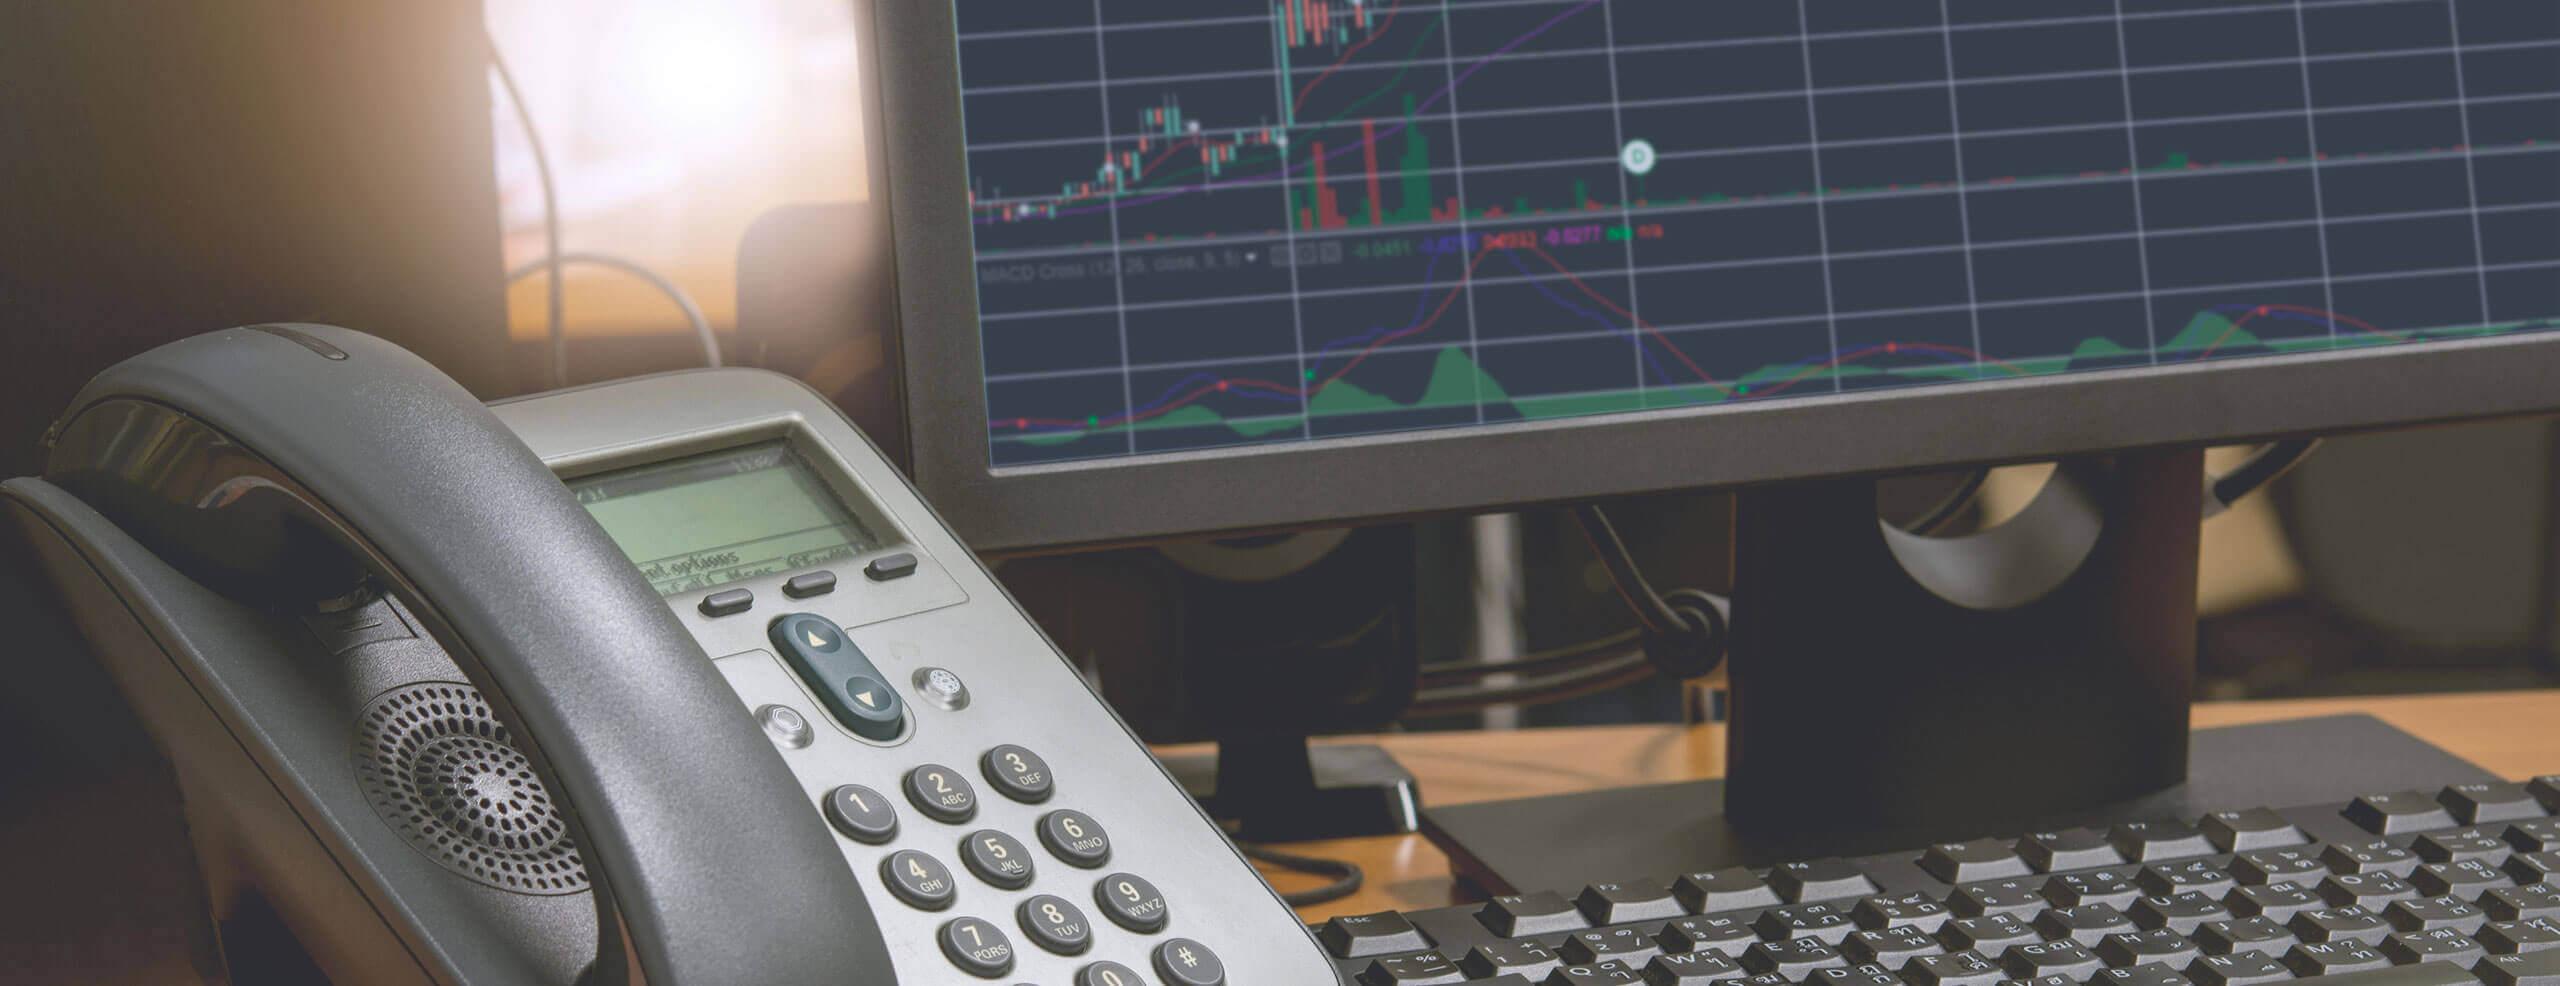 VOIP Repair, Voice Over IP